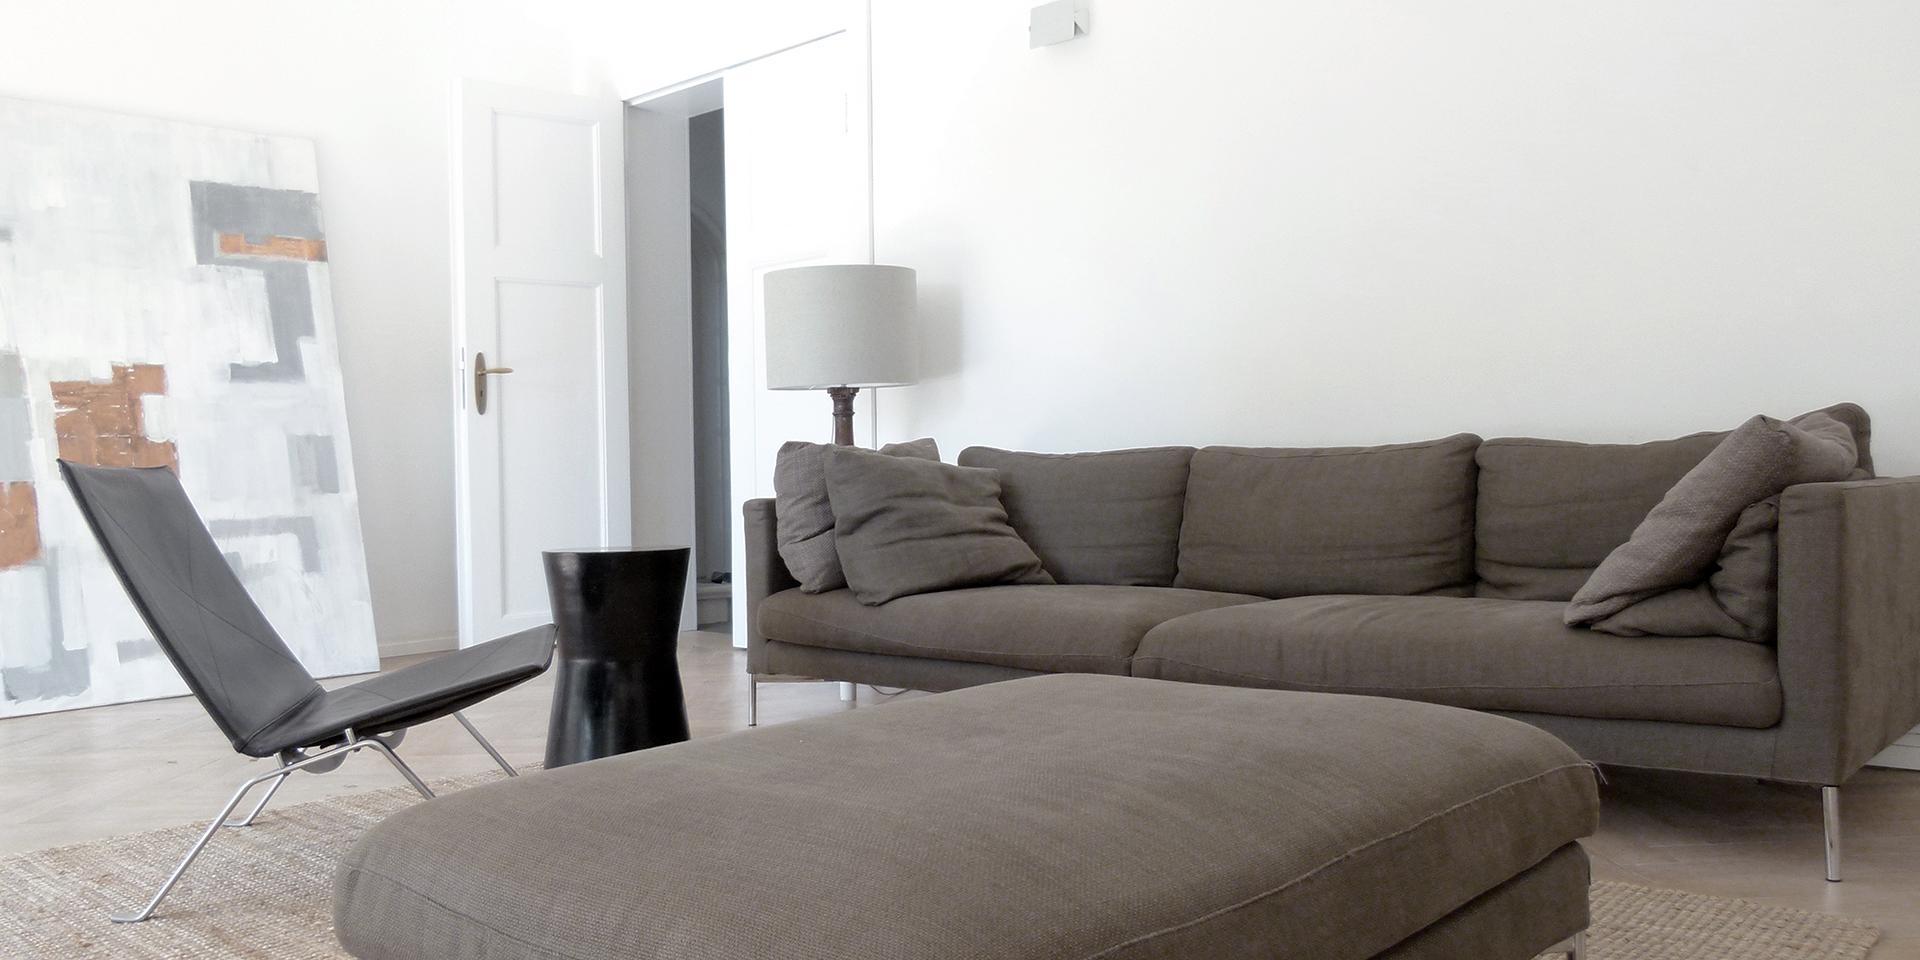 haus berlin isabel albano m ller b ro f r innenarchitektur. Black Bedroom Furniture Sets. Home Design Ideas